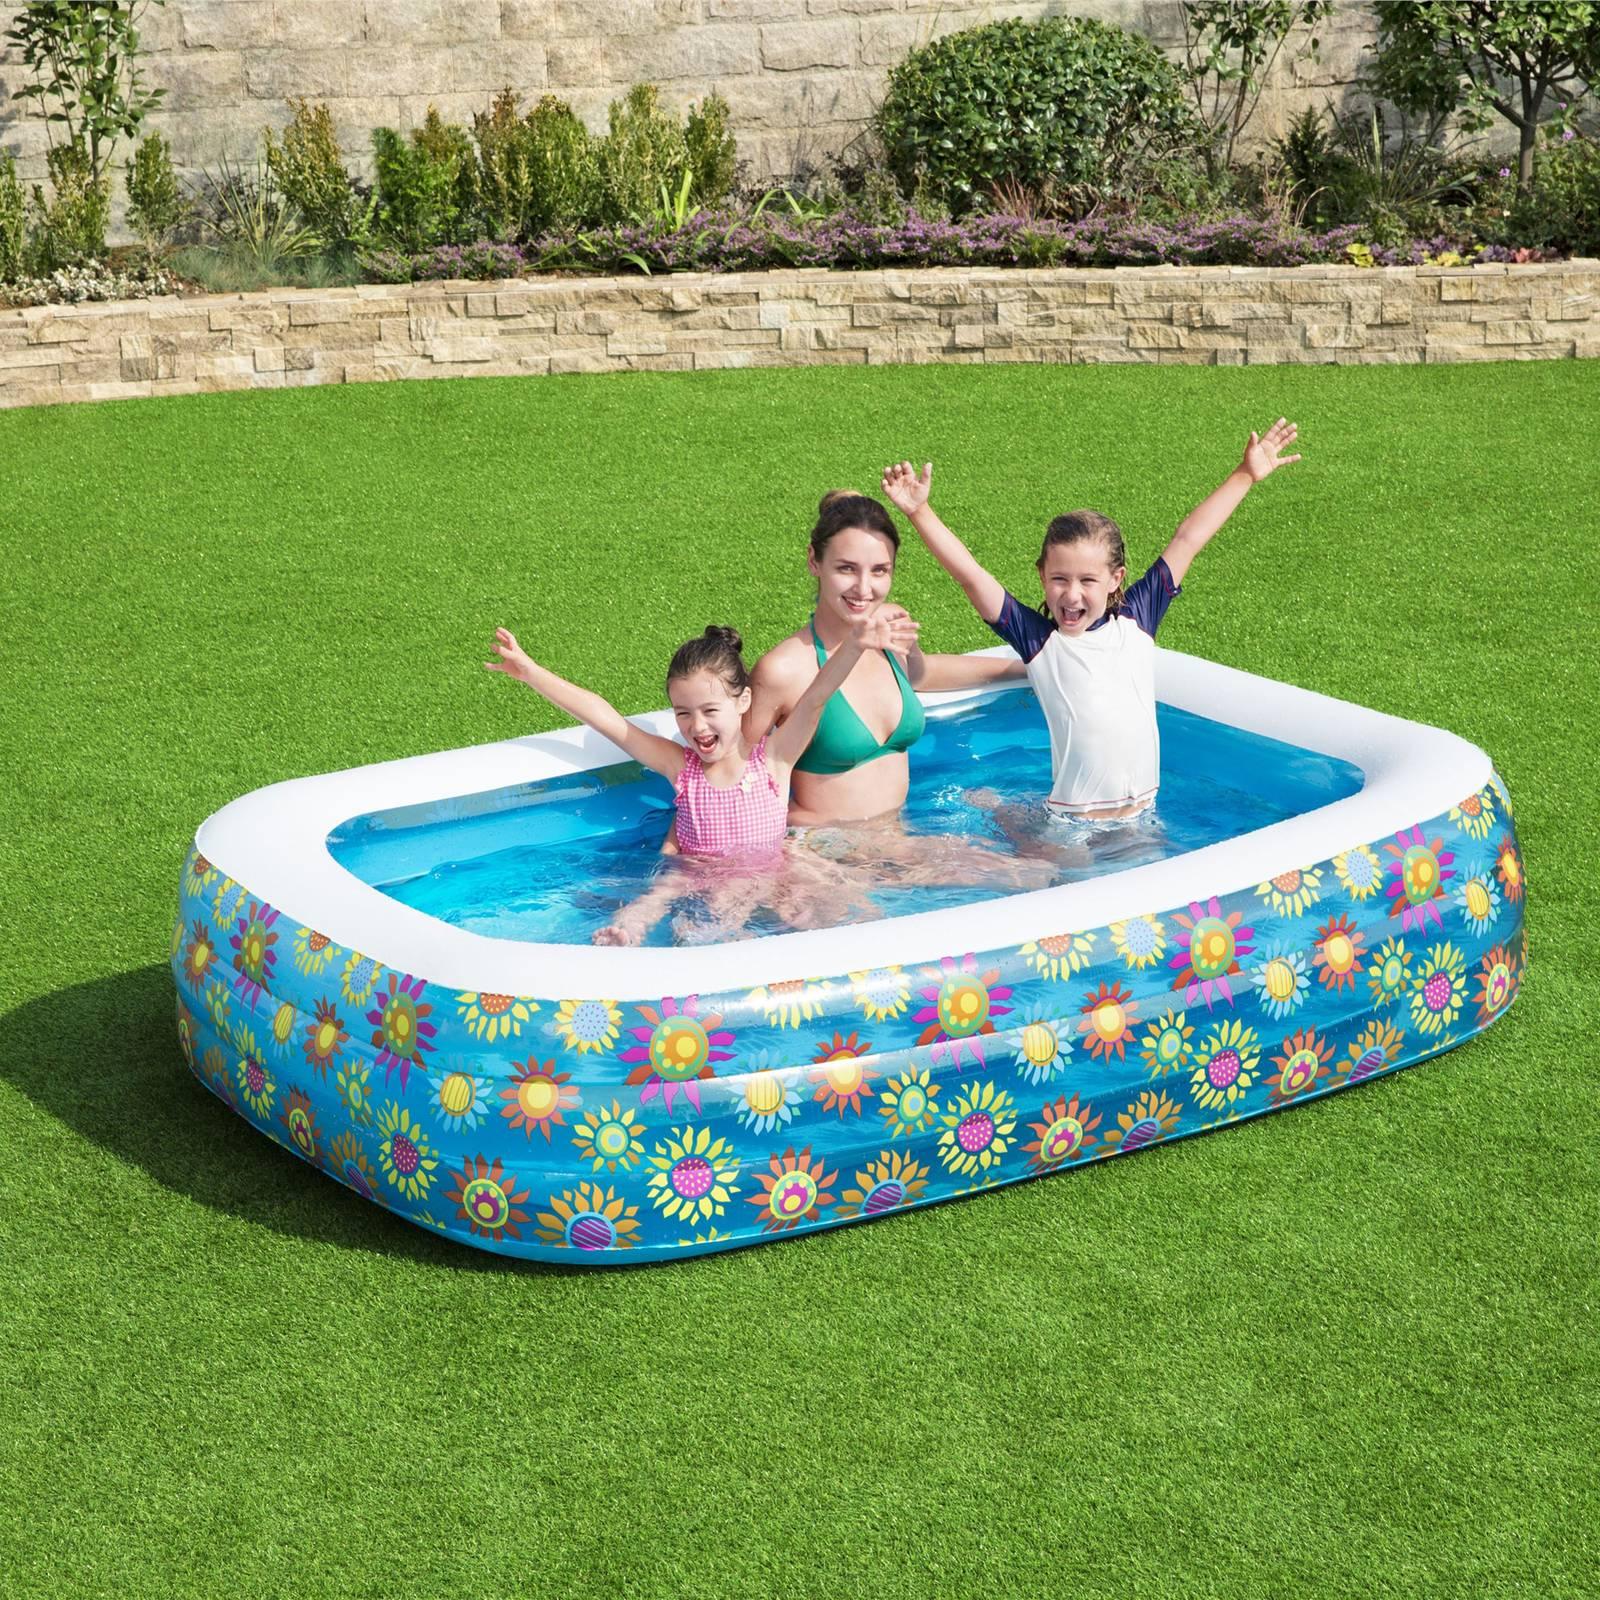 Basen dmuchany Play Pool 229 x 152 x 56 cm BESTWAY – MIX KOLORÓW